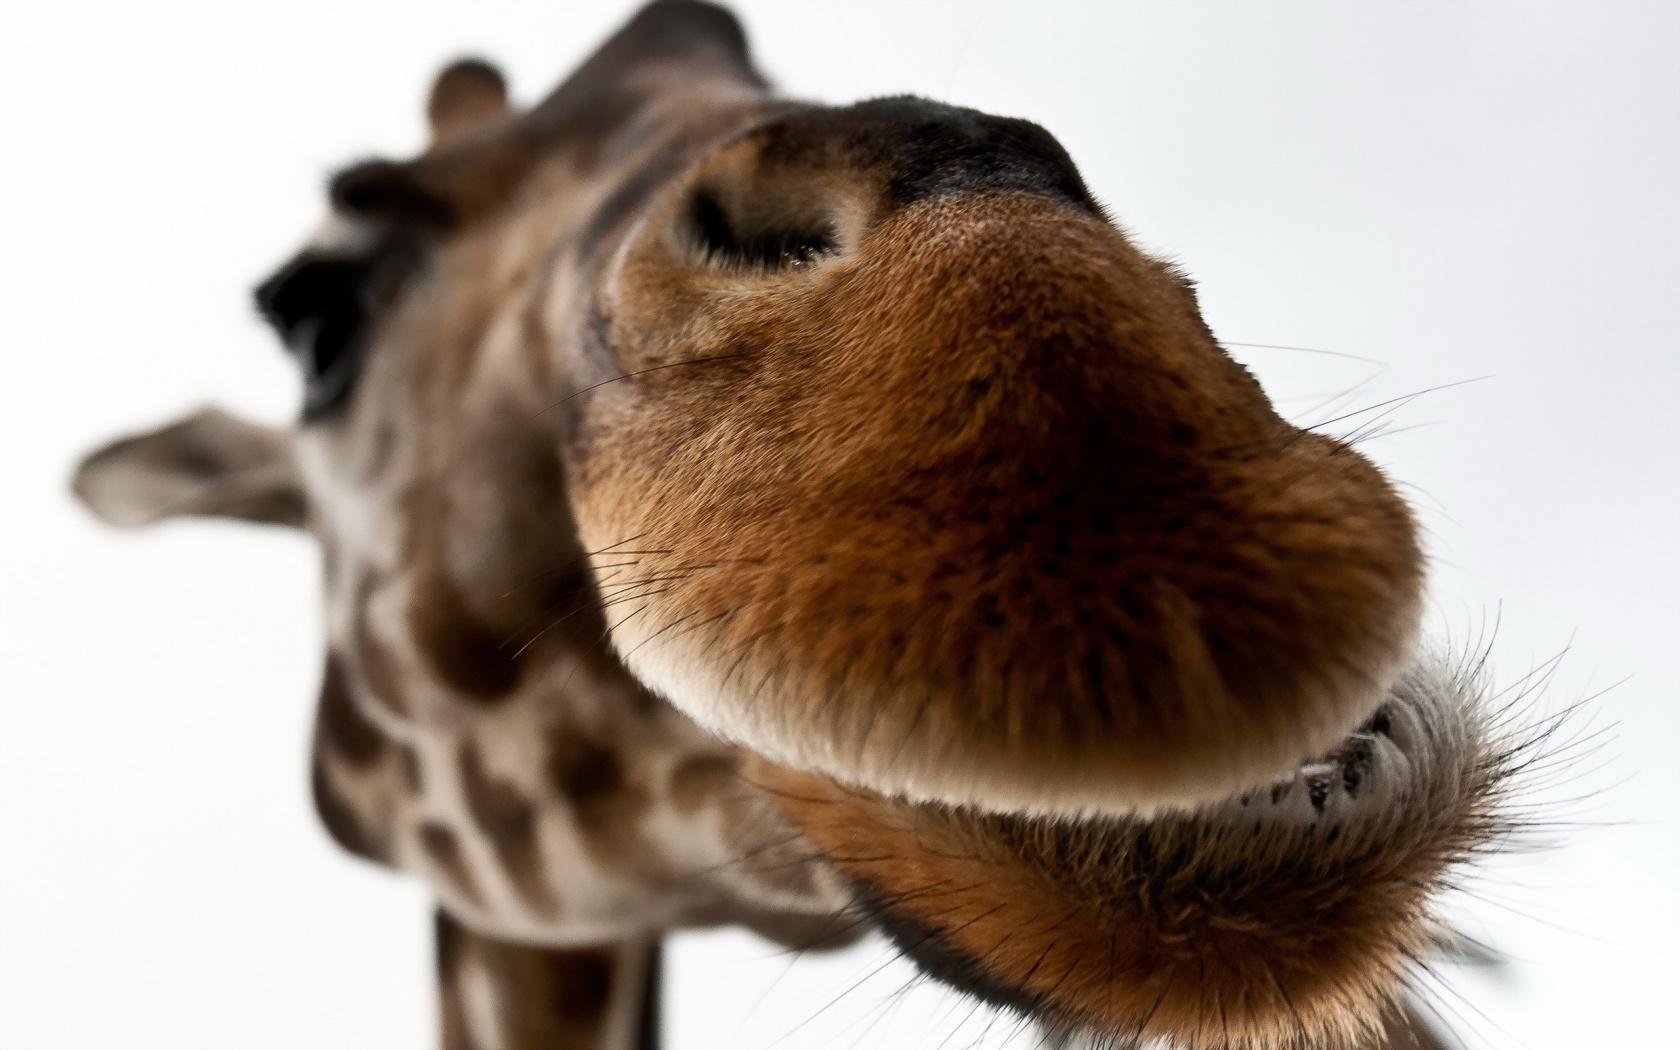 cute giraffe wallpapers